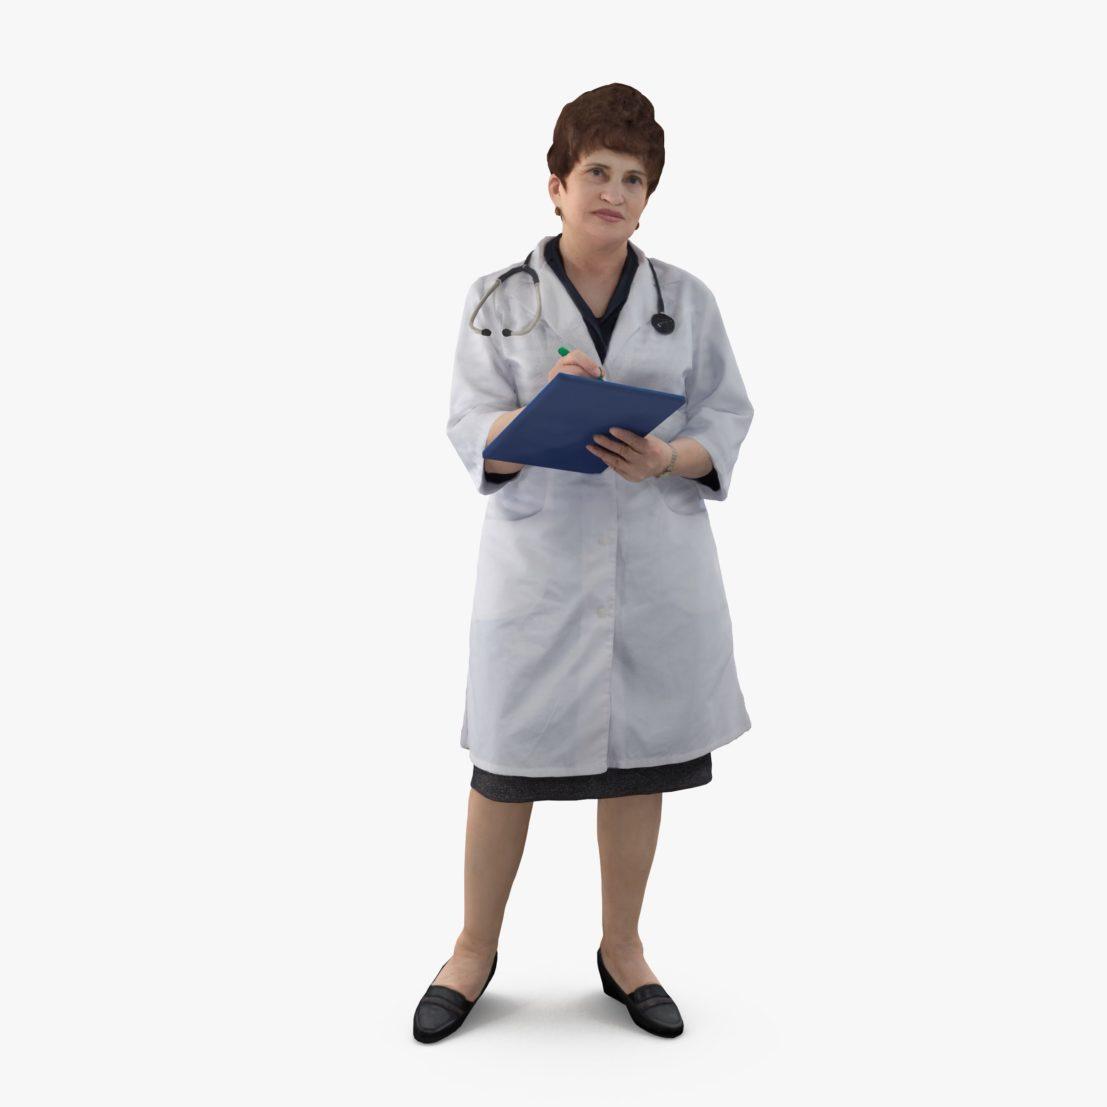 Medical Female Standing 3D Model   3DTree Scanning Studio